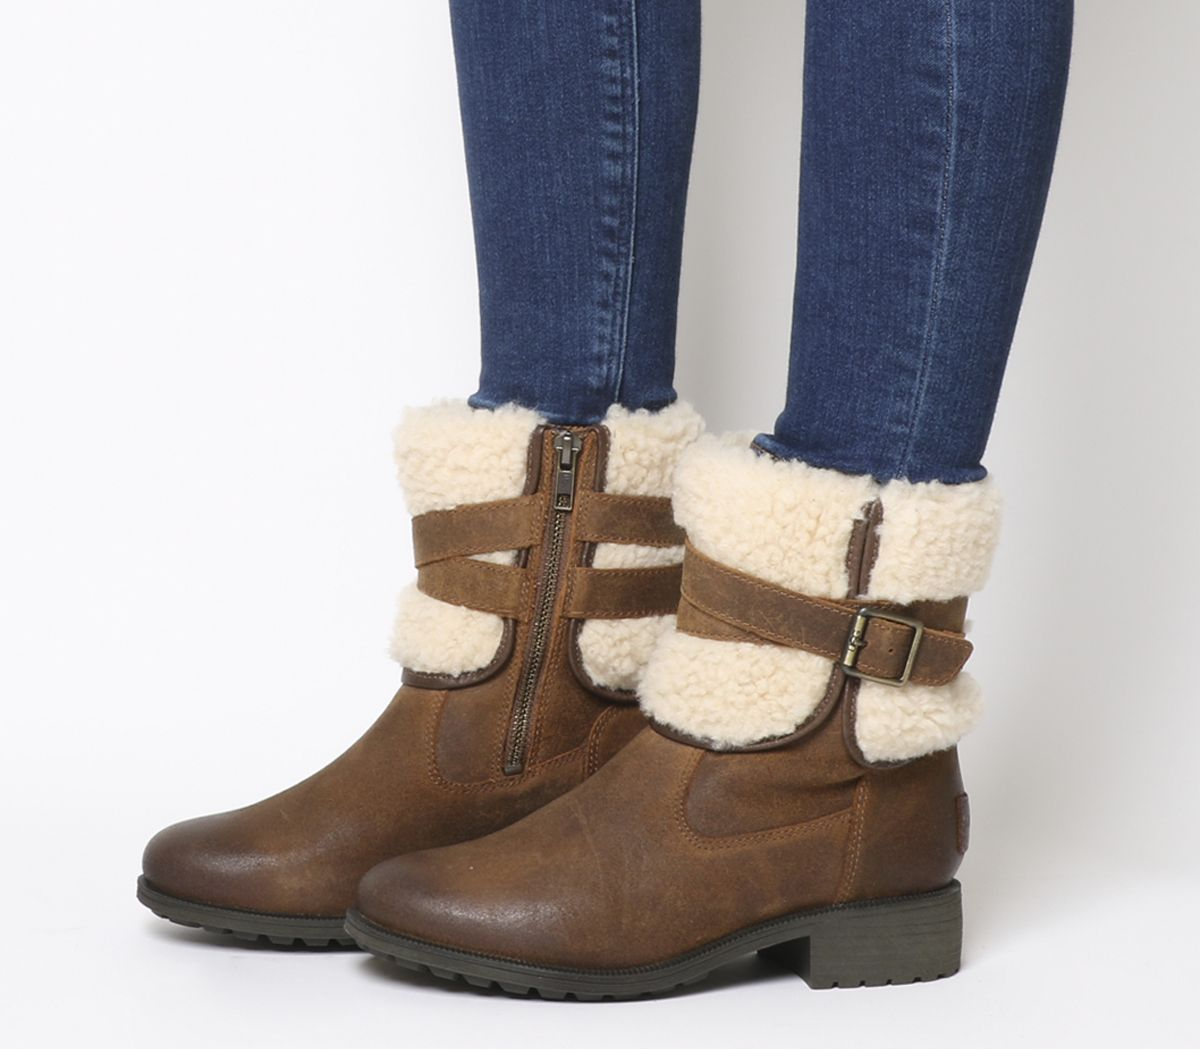 9466e31bb28 Blayre III Boots